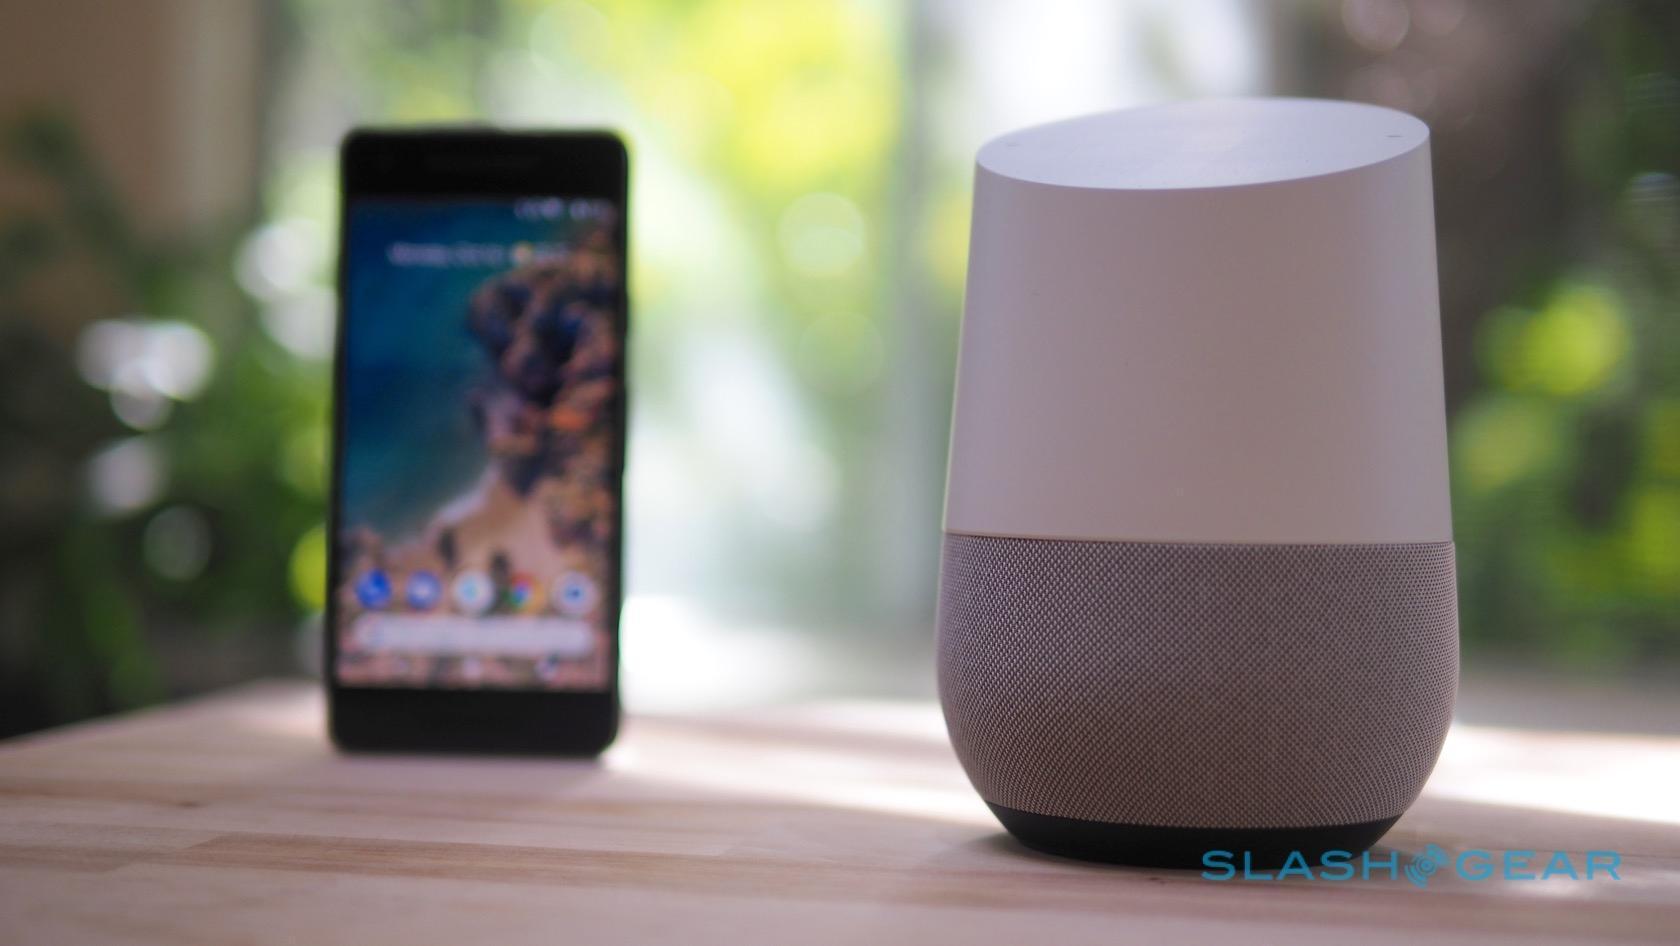 Google Pixel 2 Review: Android camera magic - SlashGear